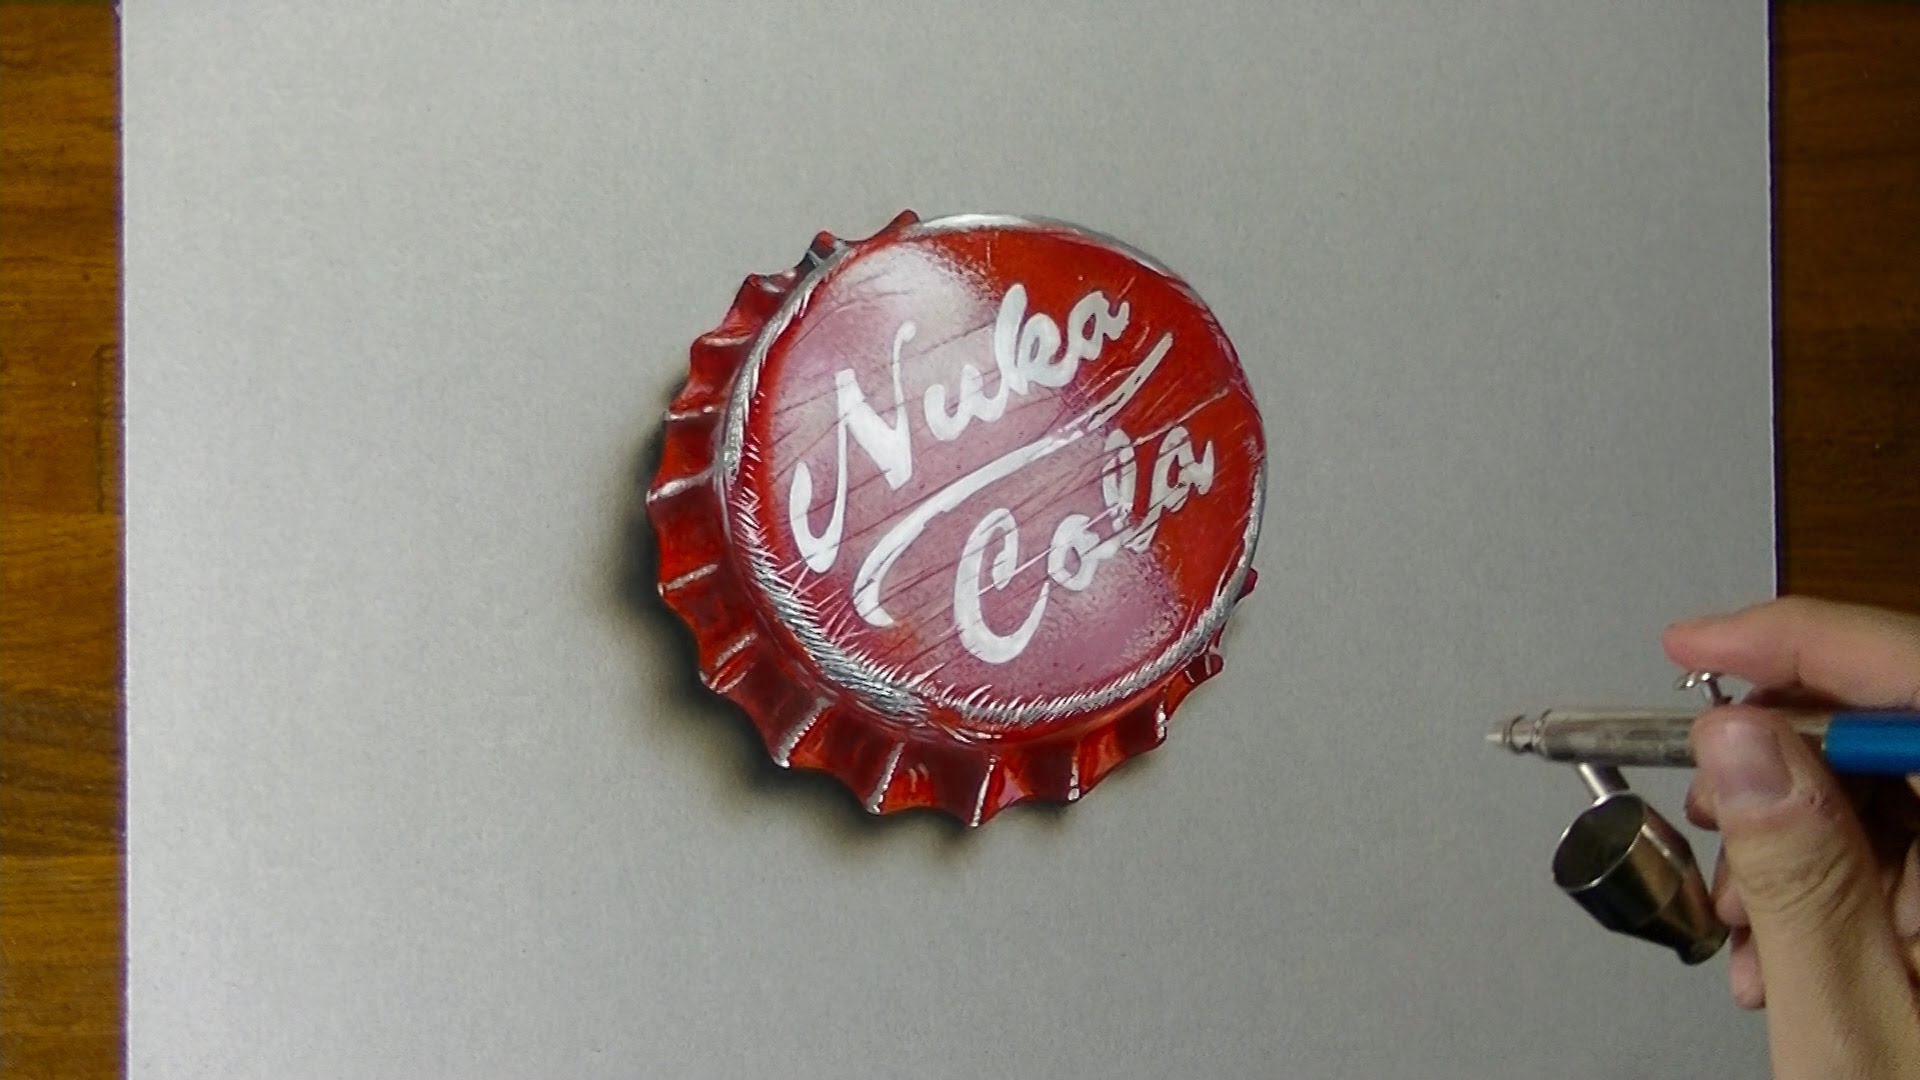 1920x1080 Fallout 4 Nuka Cola Bottlecap Drawing